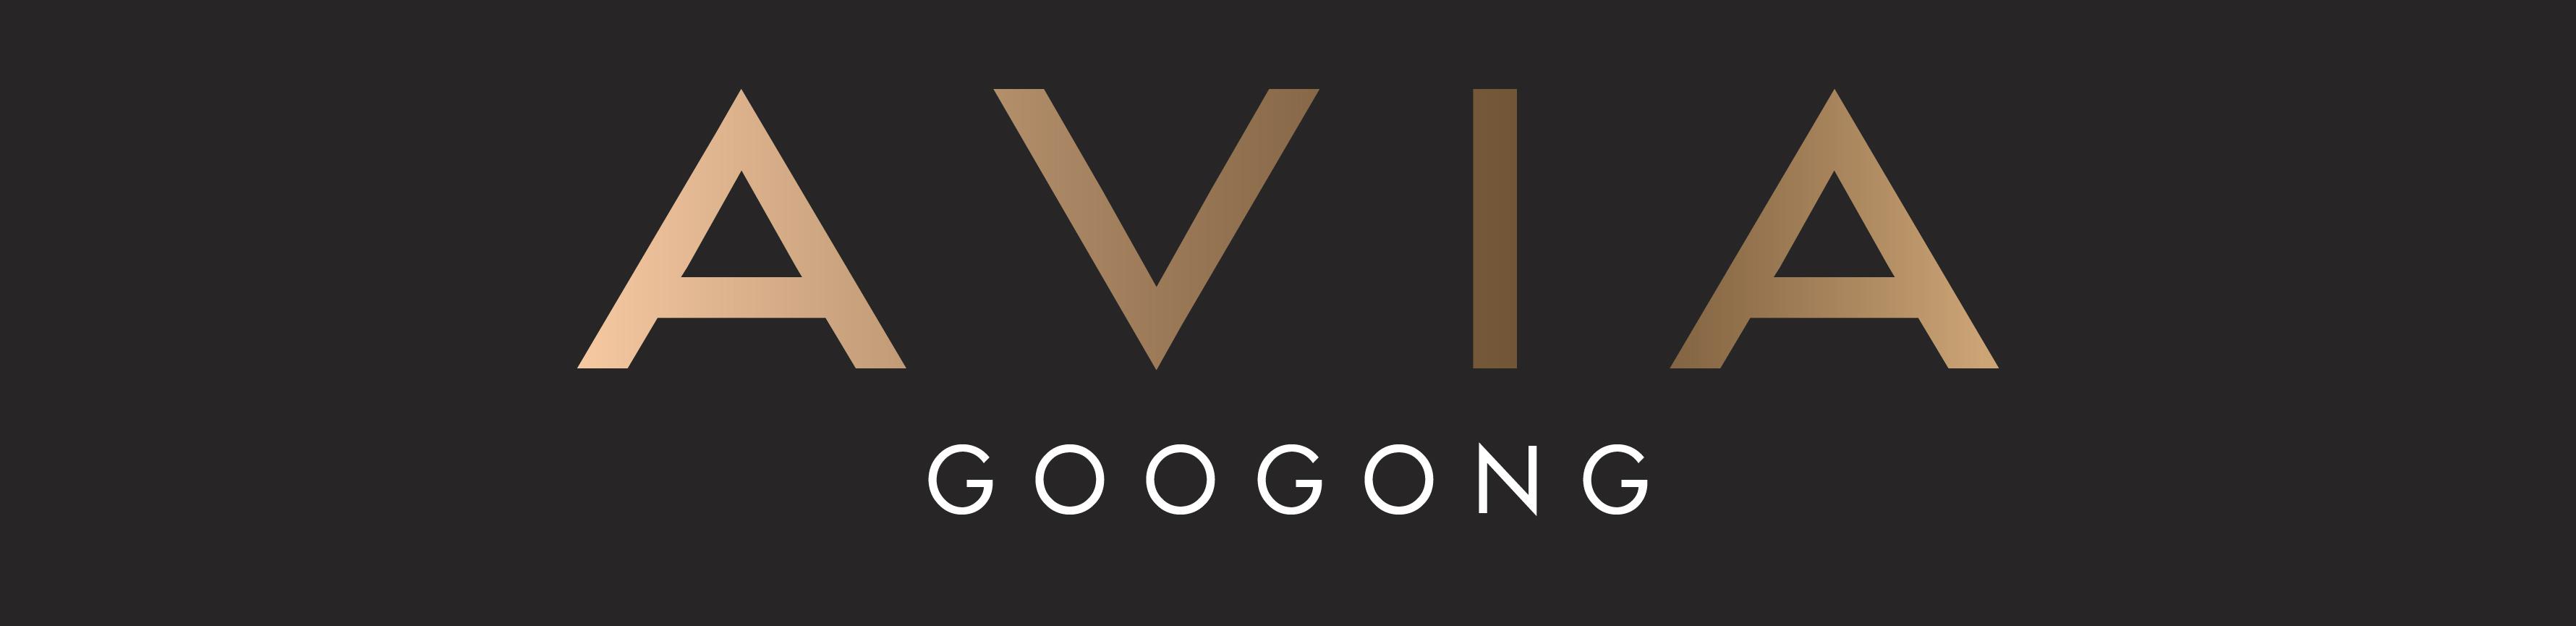 Avia Googong